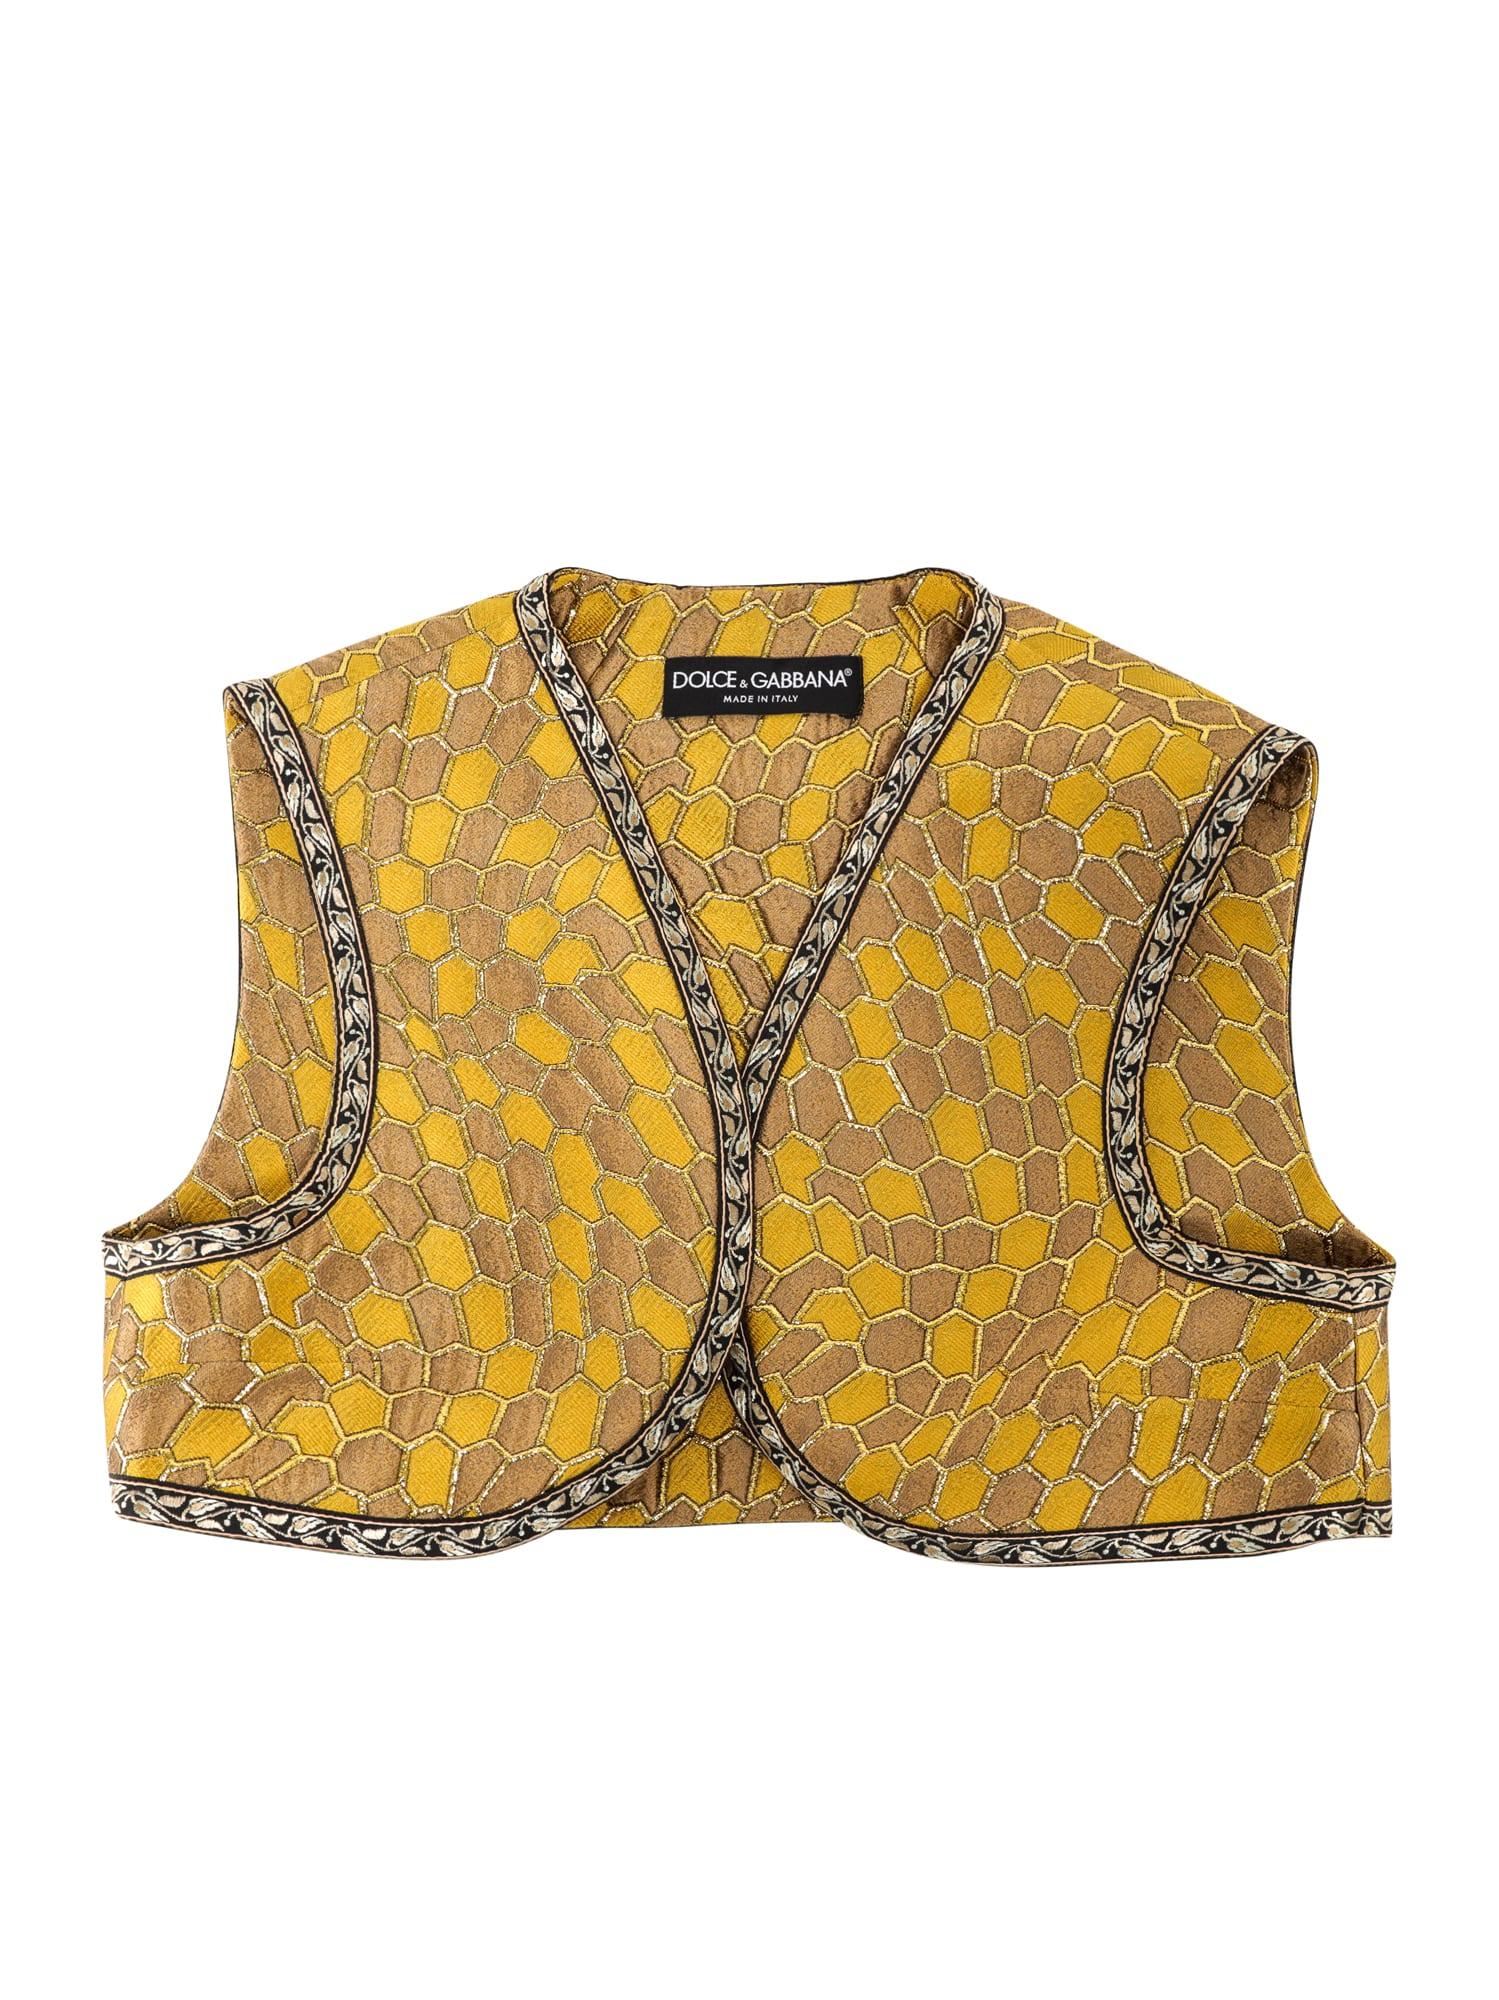 Dolce & Gabbana Clothing BOLERO